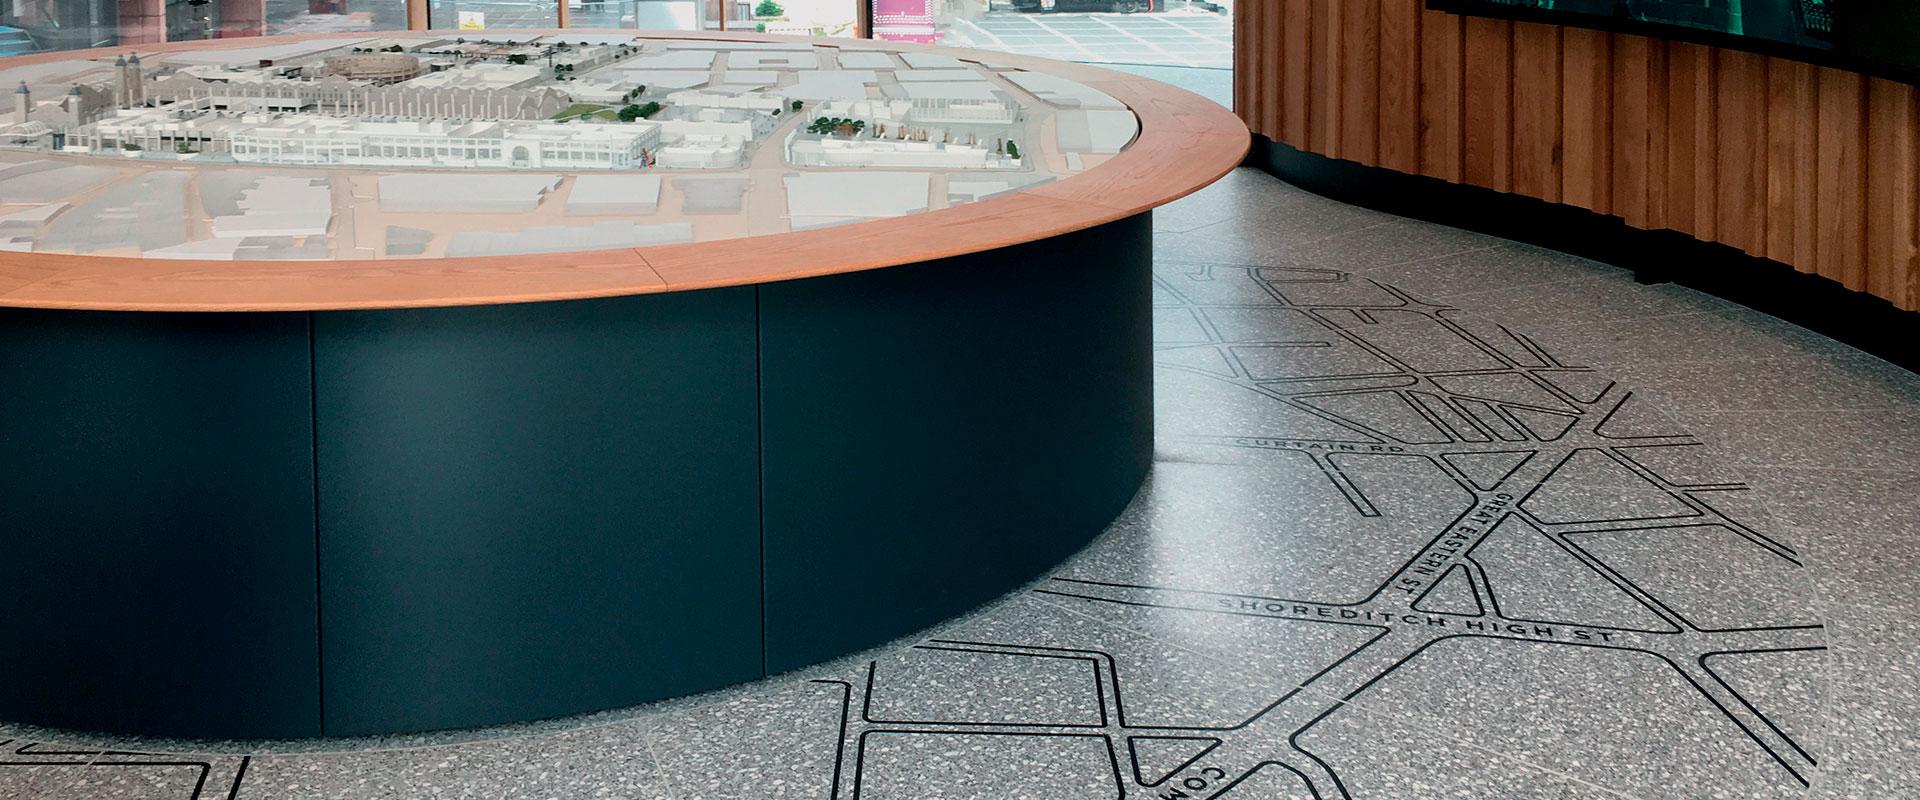 AGGLOTECH-progetto-broadgate-project-london-slider-